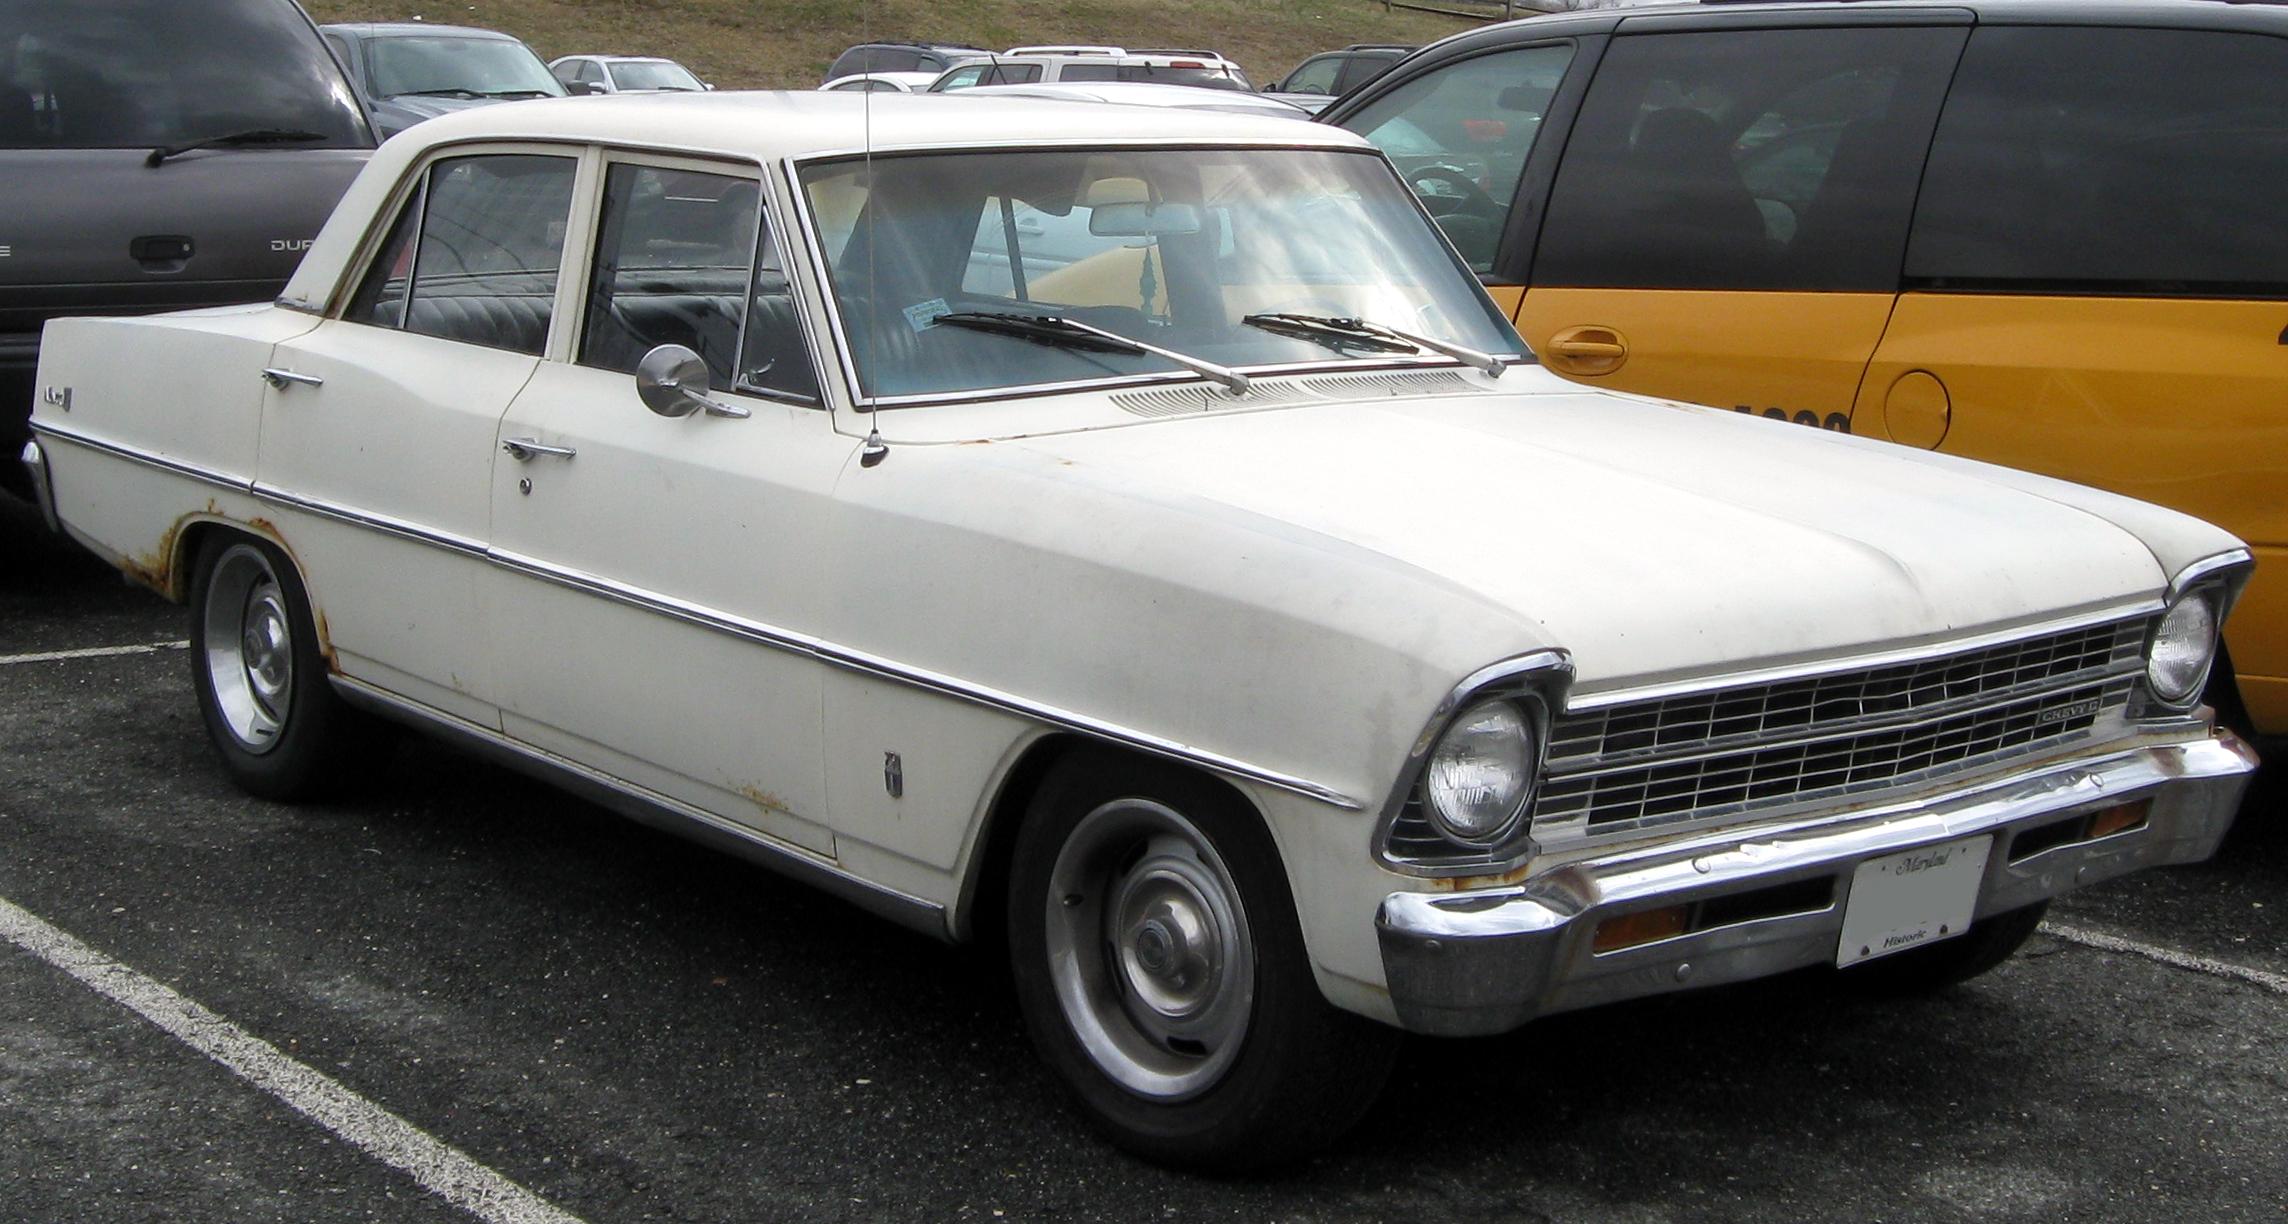 Nova Sedan Pic Autos Post